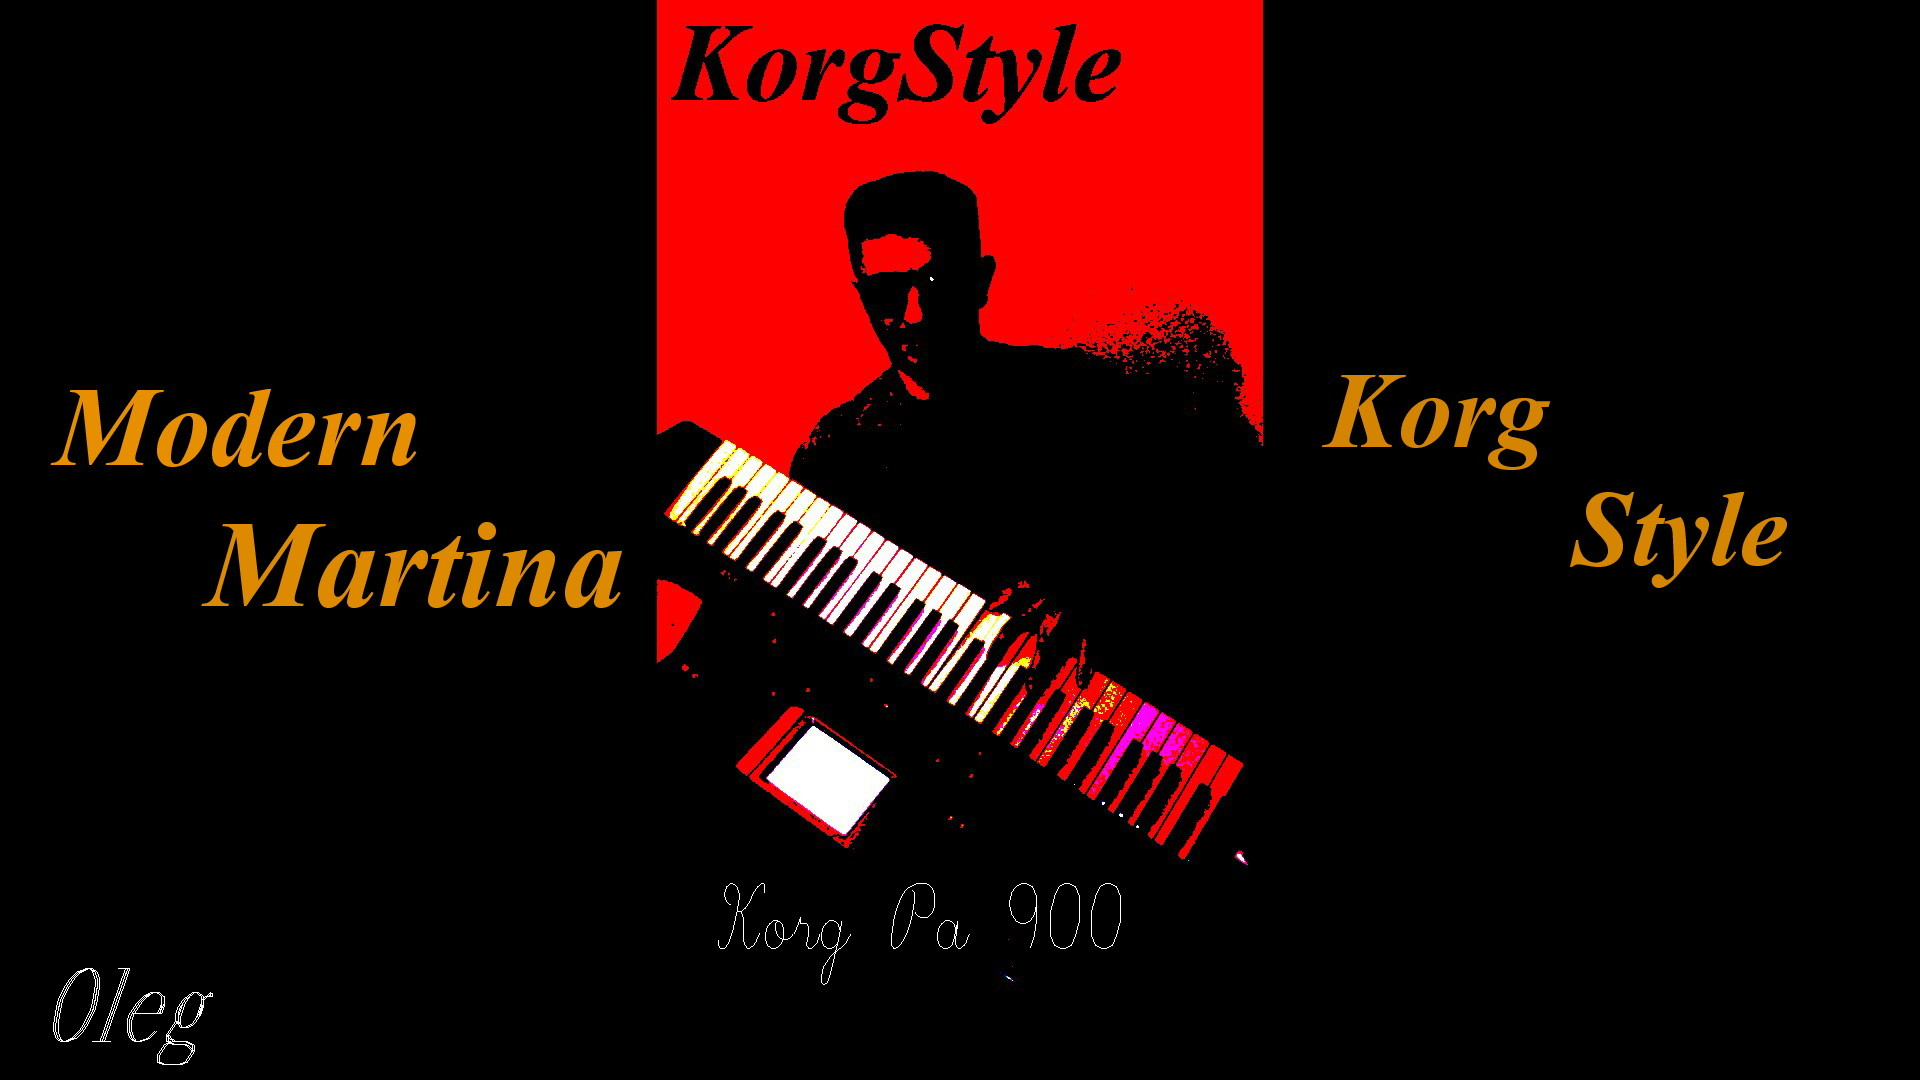 KorgStyle & M Martina-Ветер осенний (Korg Pa 900) EuroDisco